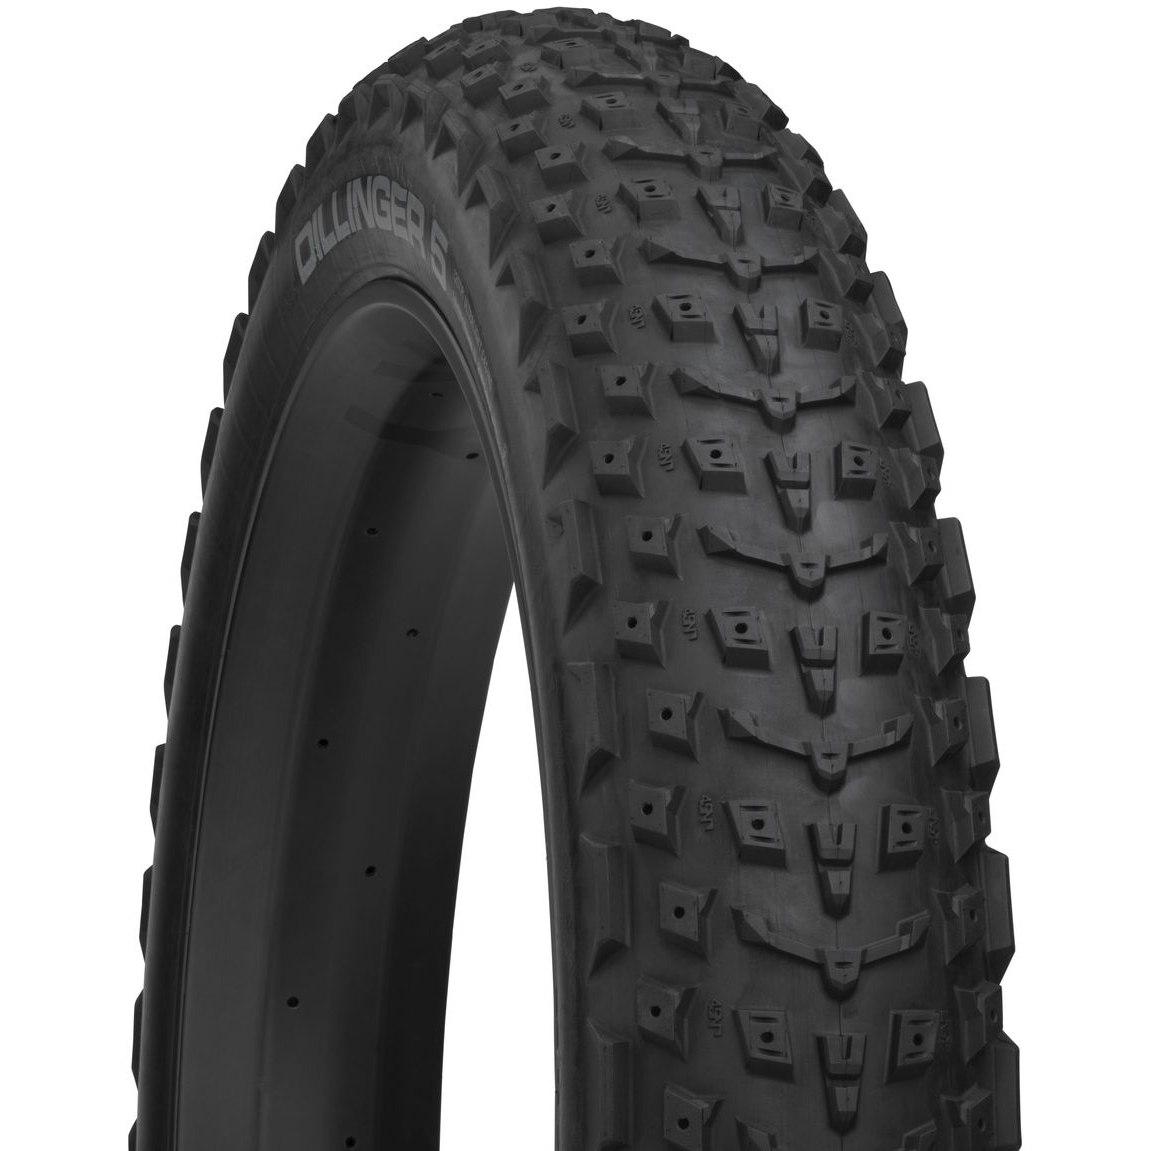 Imagen de 45NRTH Dillinger 5 Fatbike Folding Tire - Spike & Tubeless Ready - 27.5x4.5 Inch - 120TPI